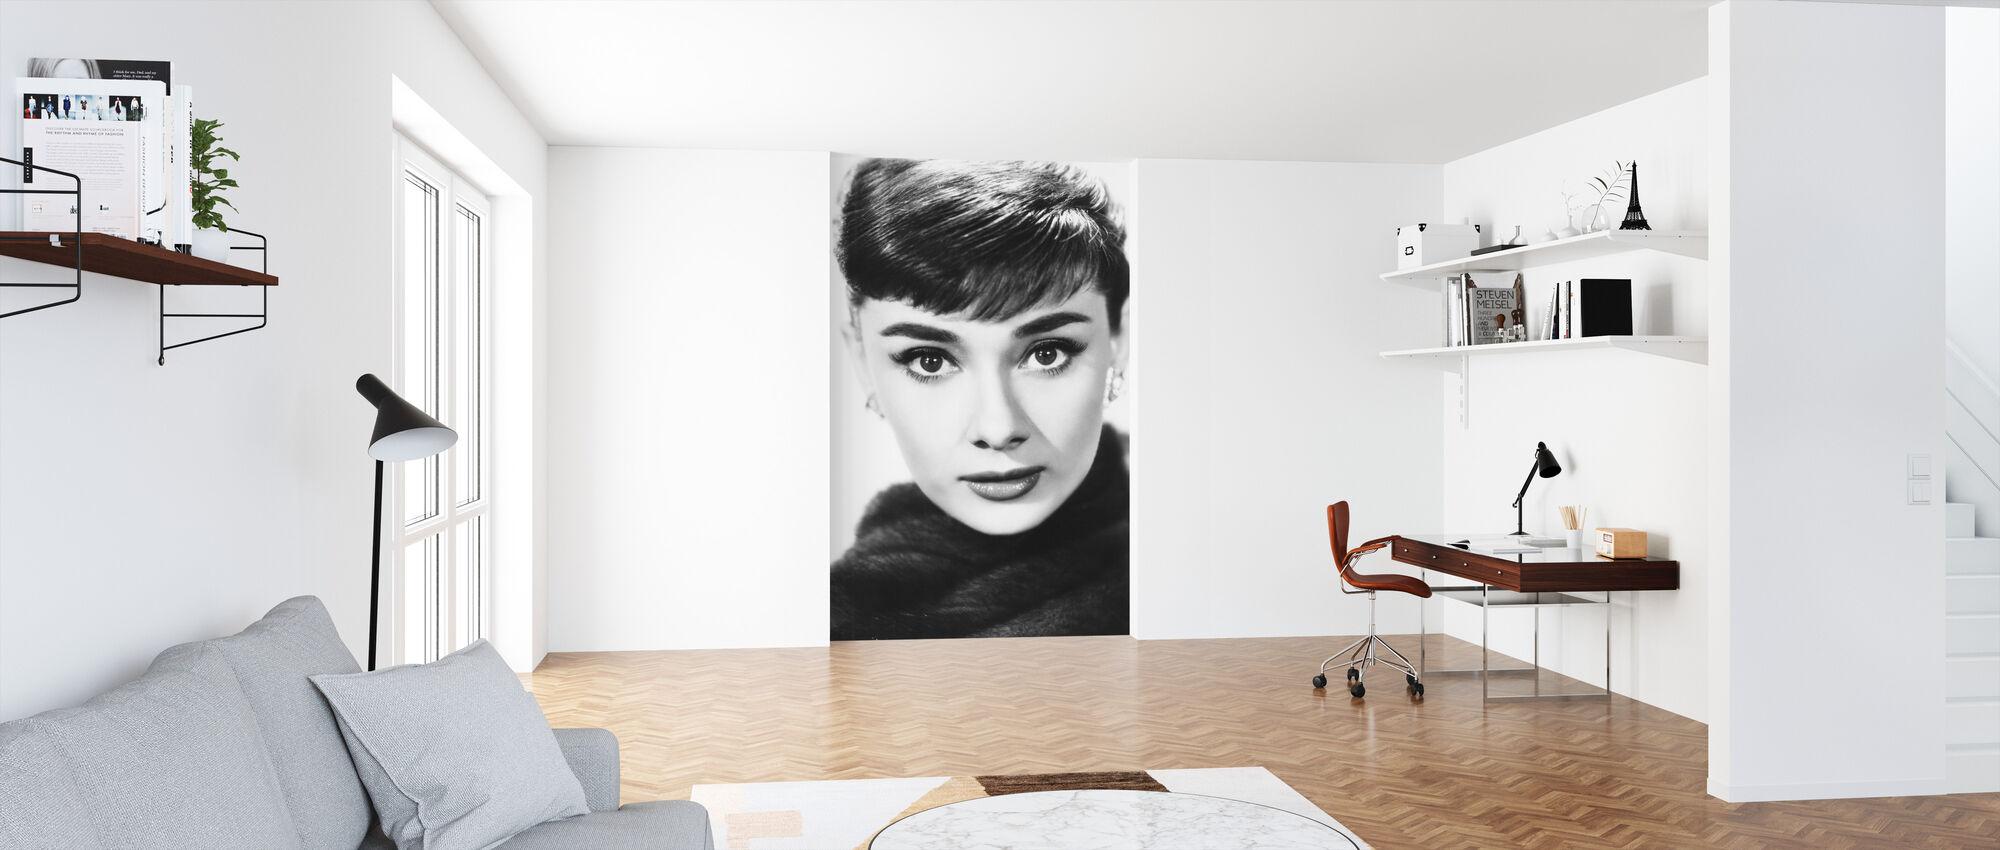 Sabrina - Wallpaper - Office